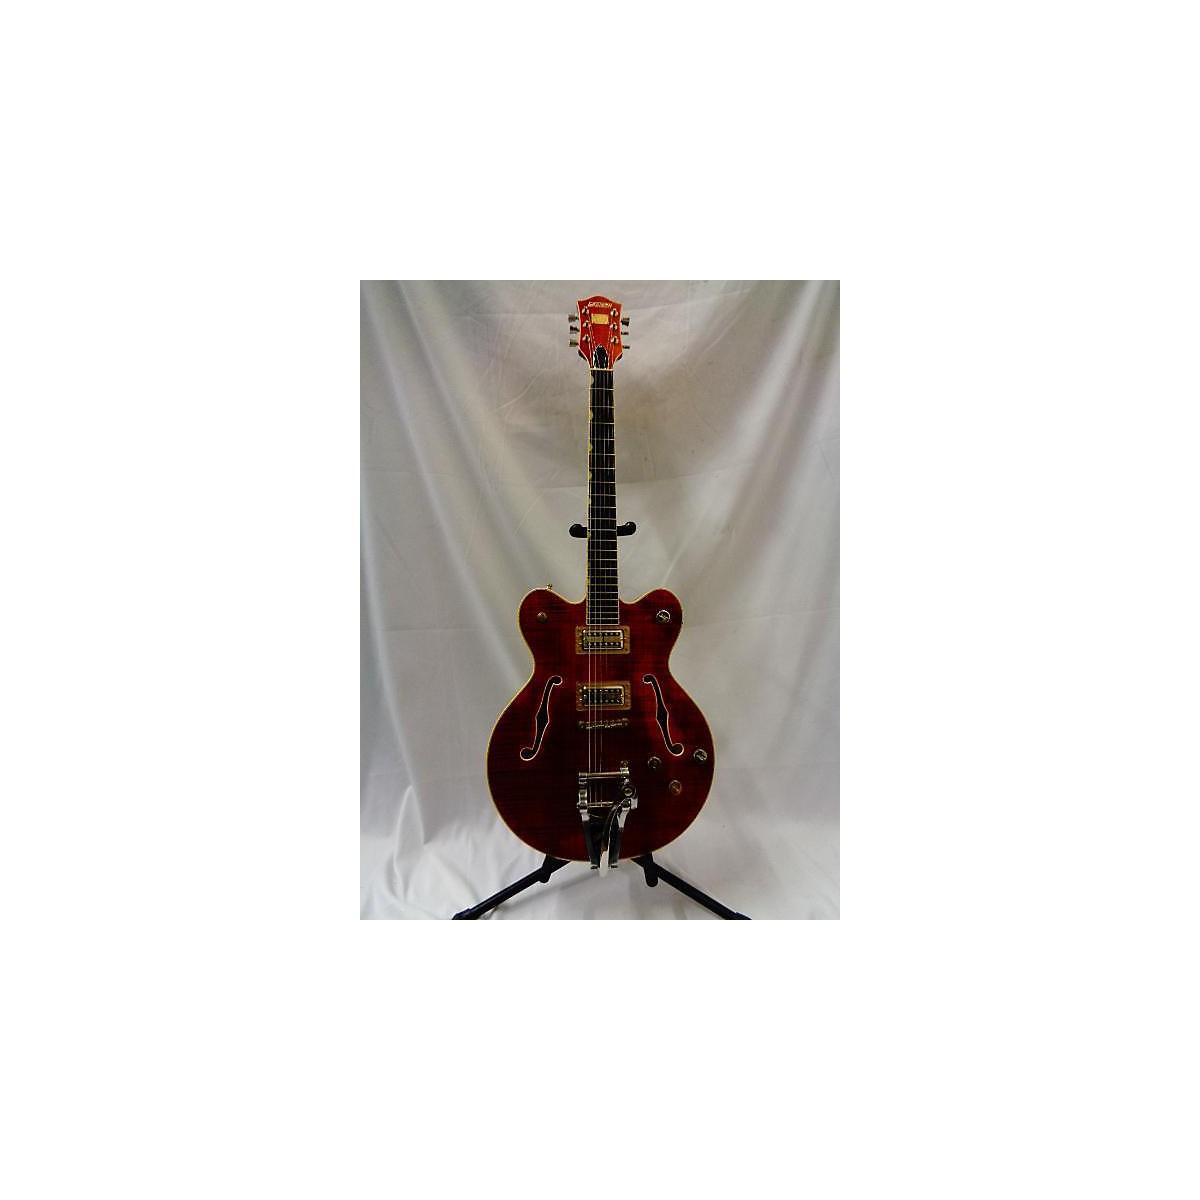 Gretsch Guitars 2017 Broadkaster G6609TDC BBNFM Hollow Body Electric Guitar